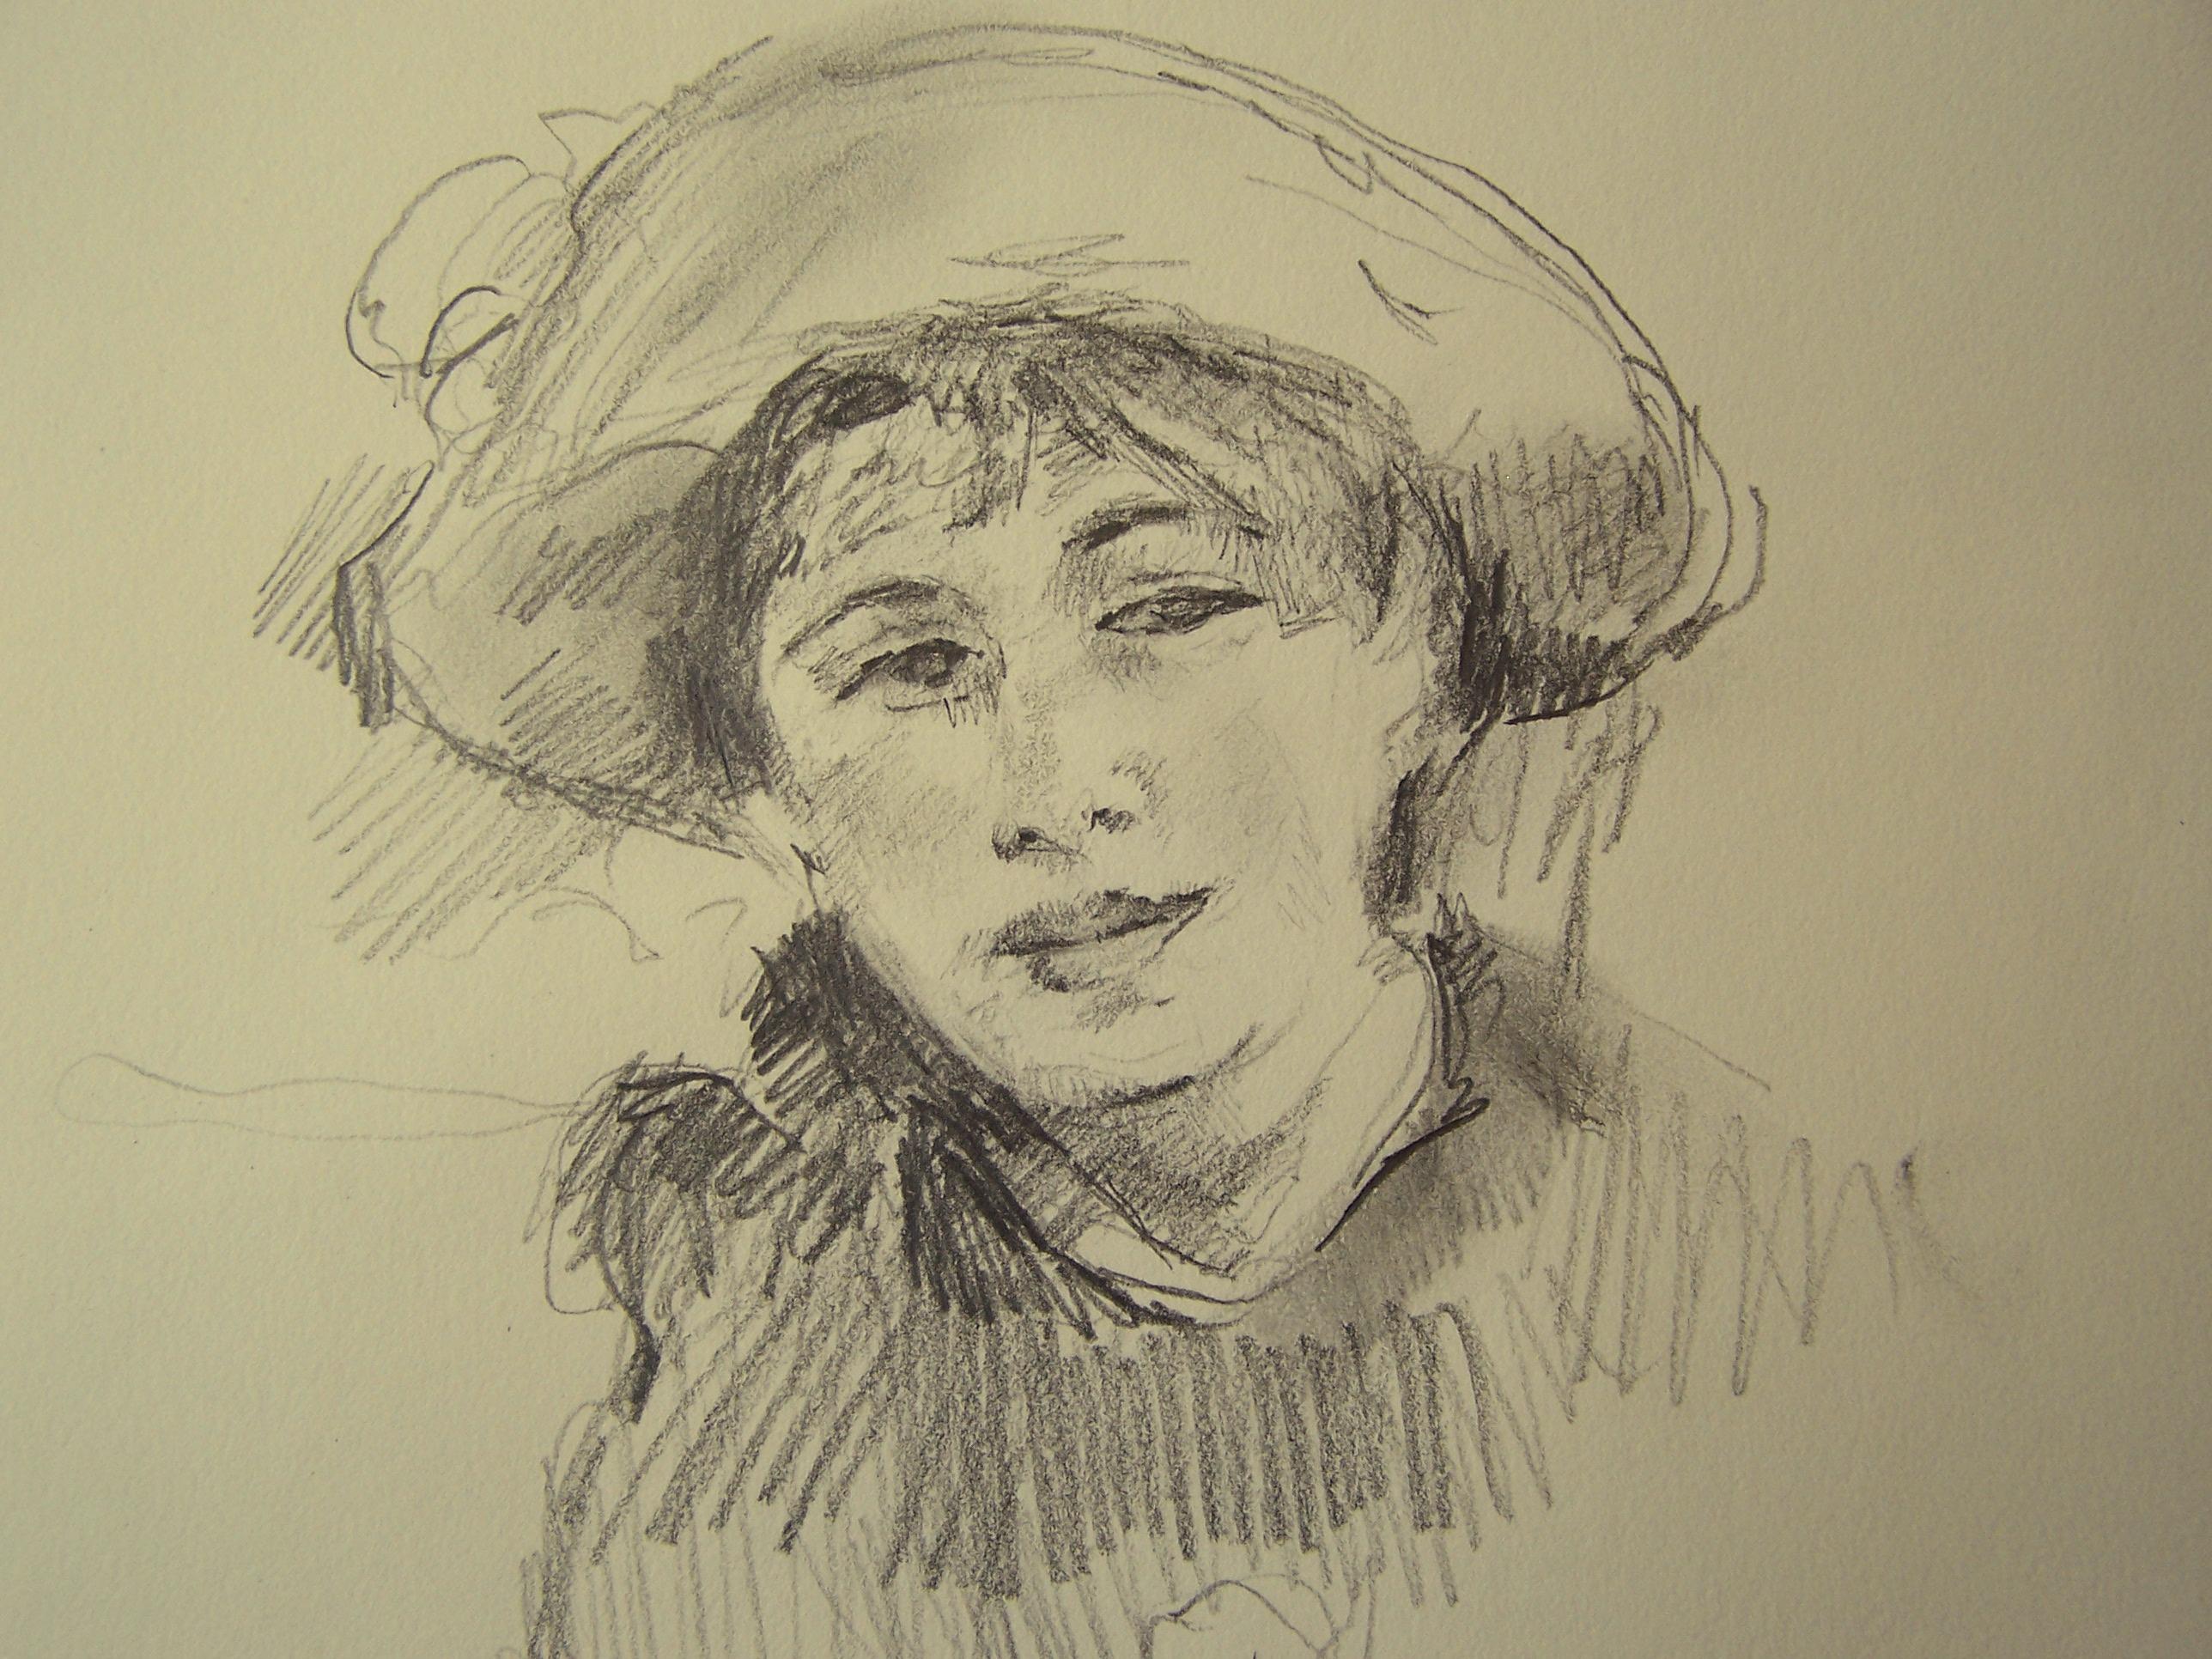 2576x1932 Thinking About Renoir Renoir, Pierre Auguste Renoir And Drawings